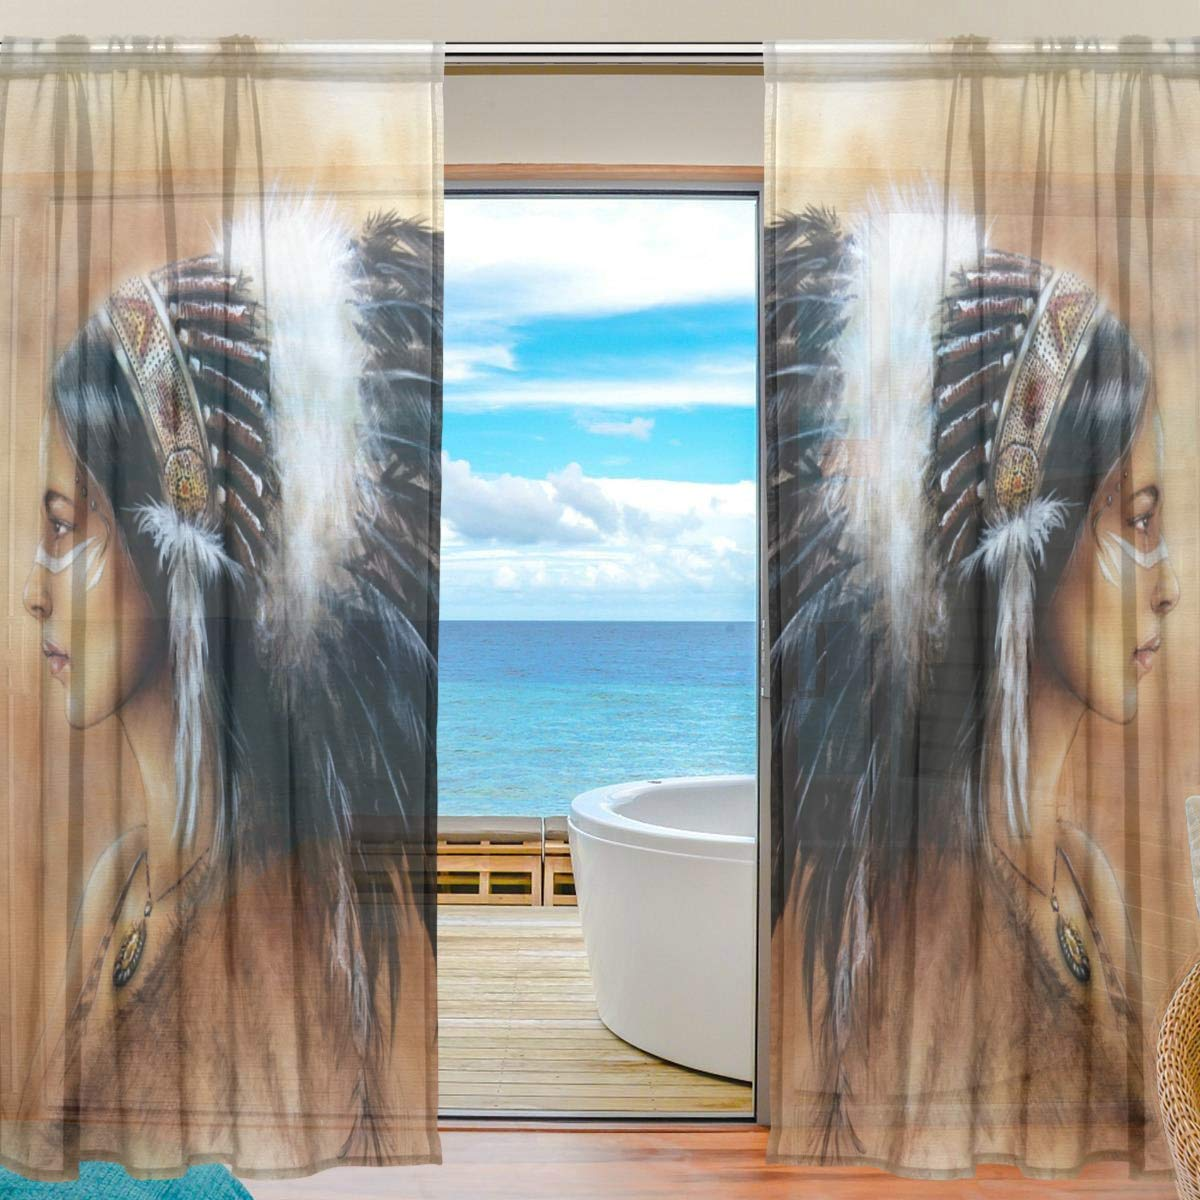 Dream Catcher Curtain Panels